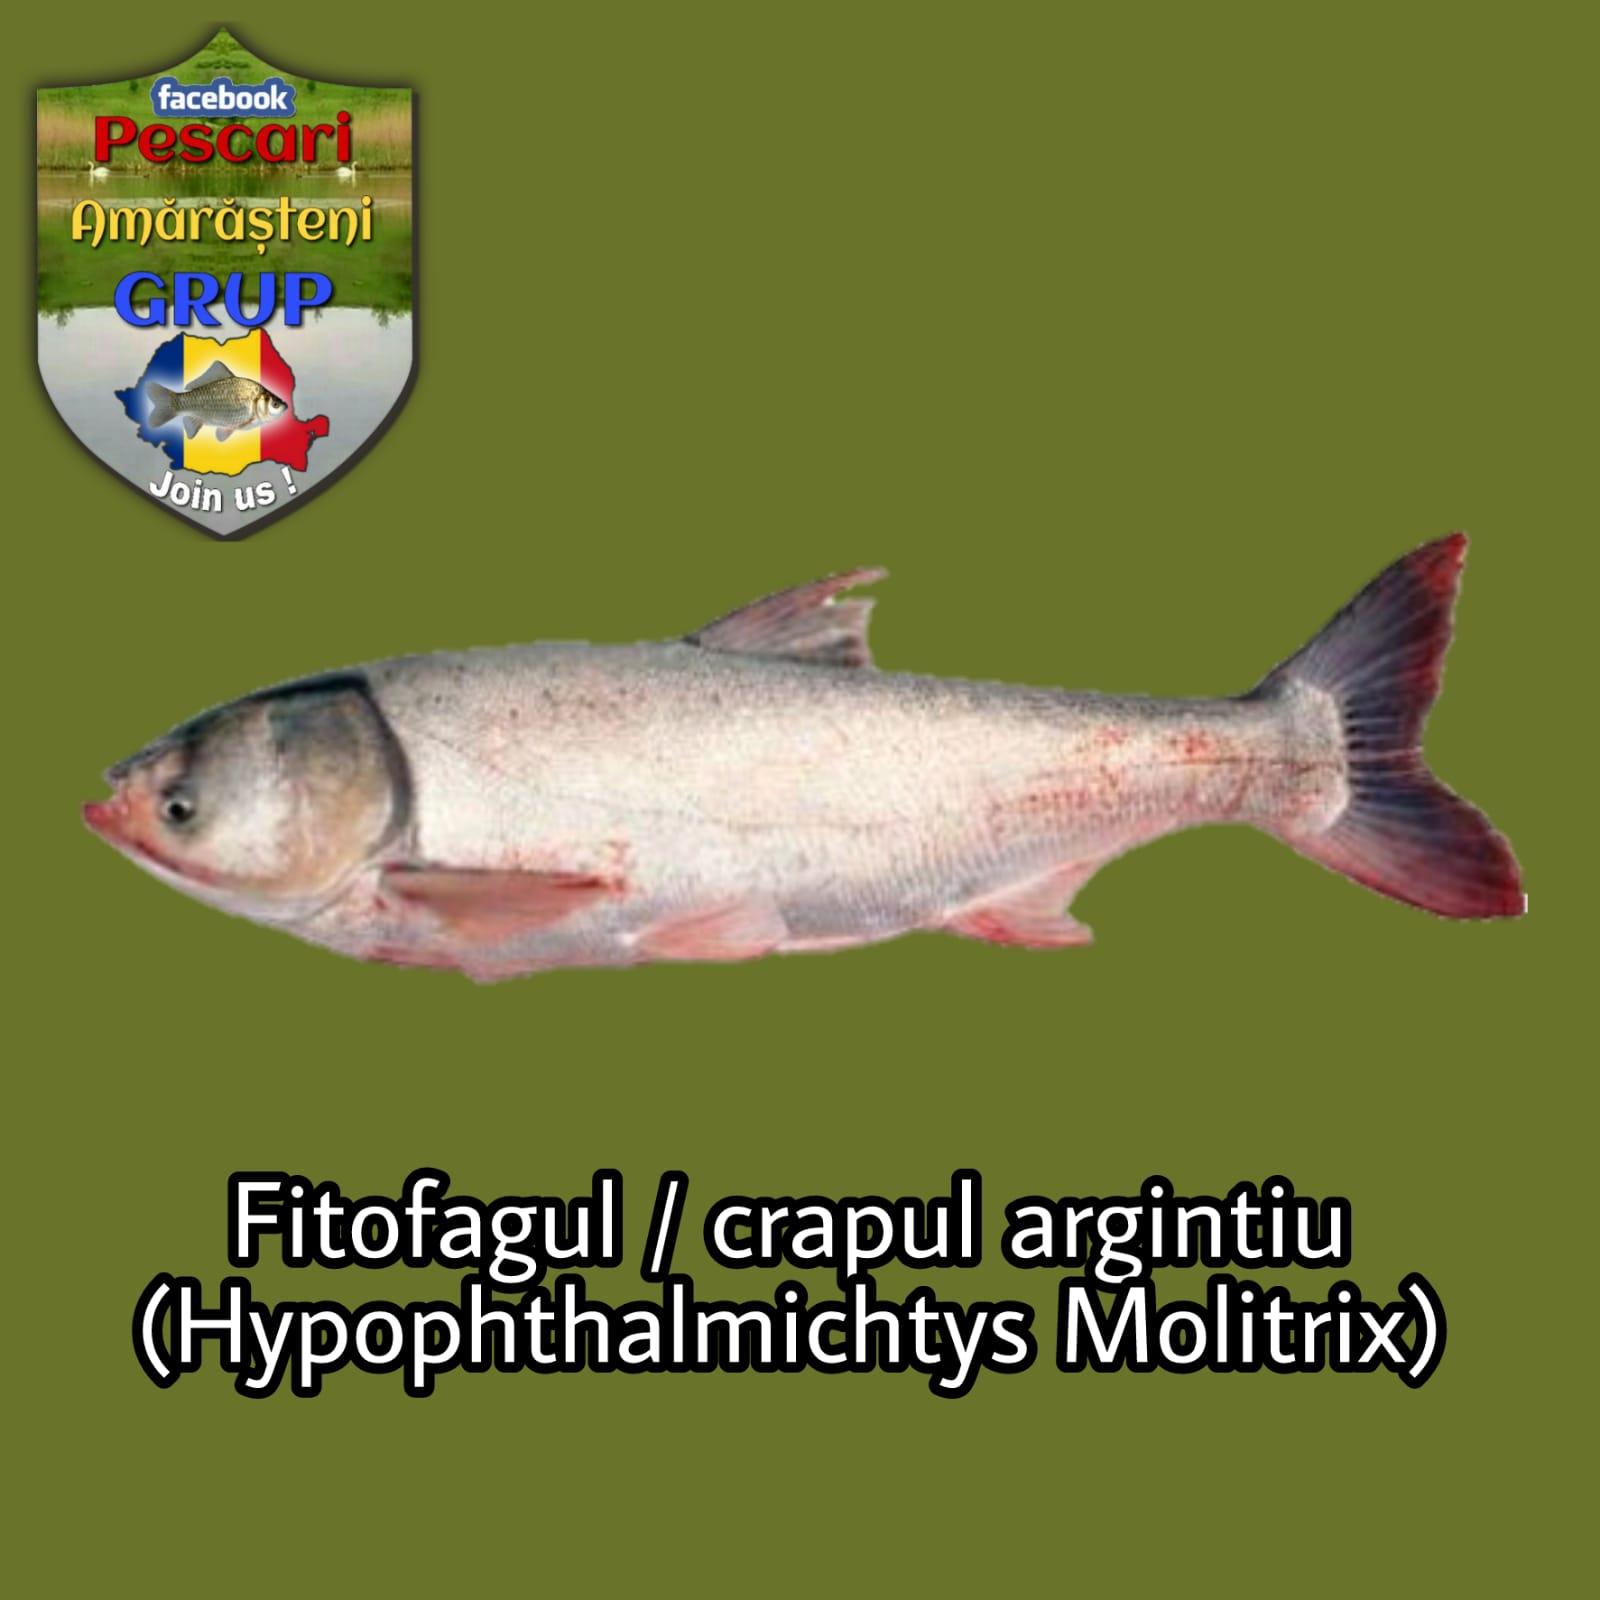 Fitofagul (Hypophthalmichtys molitrix)